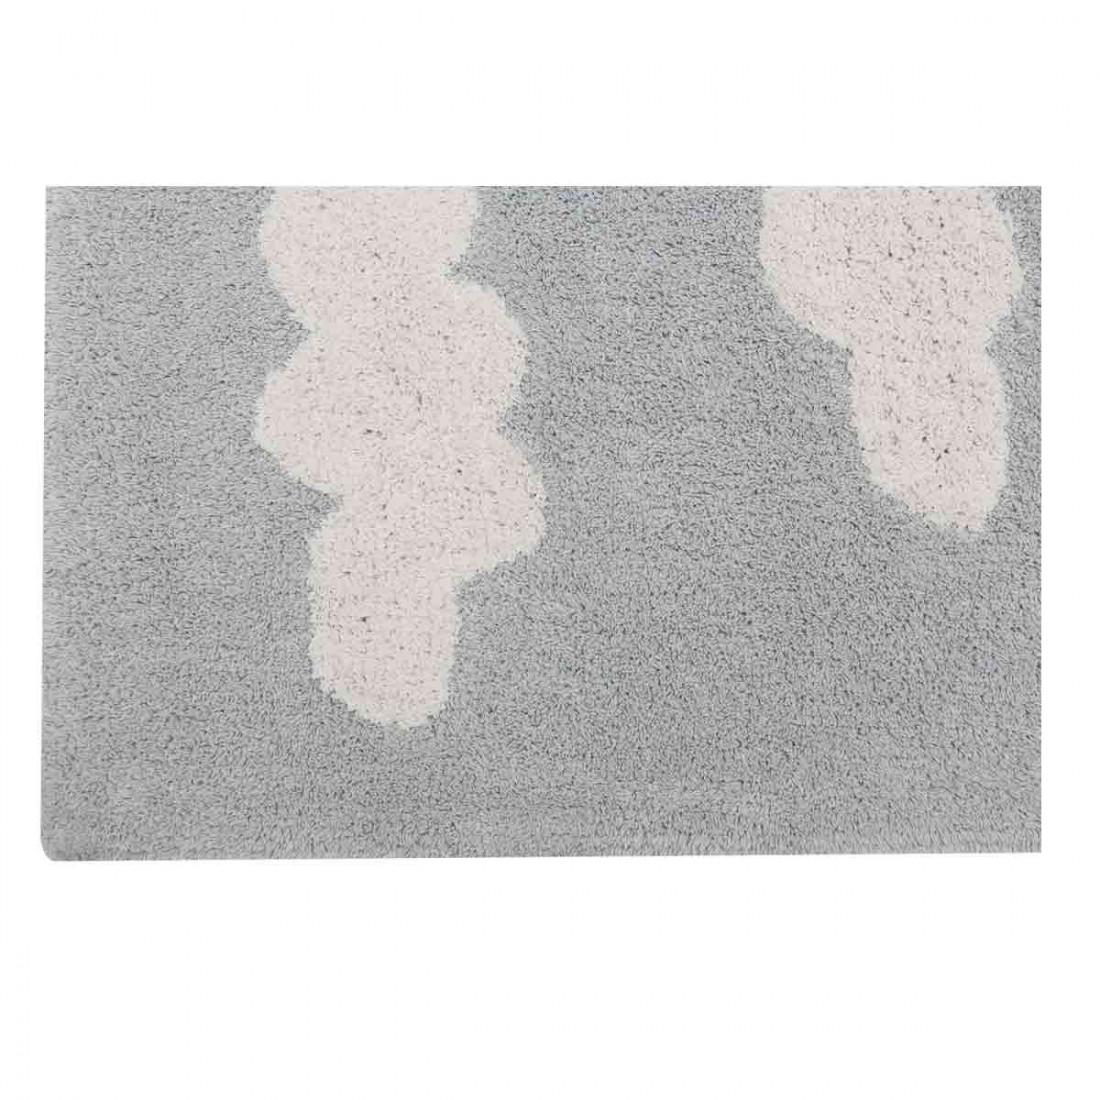 tapis enfant coton lavable gris nuages blanc lorena canals ma chambramoi. Black Bedroom Furniture Sets. Home Design Ideas